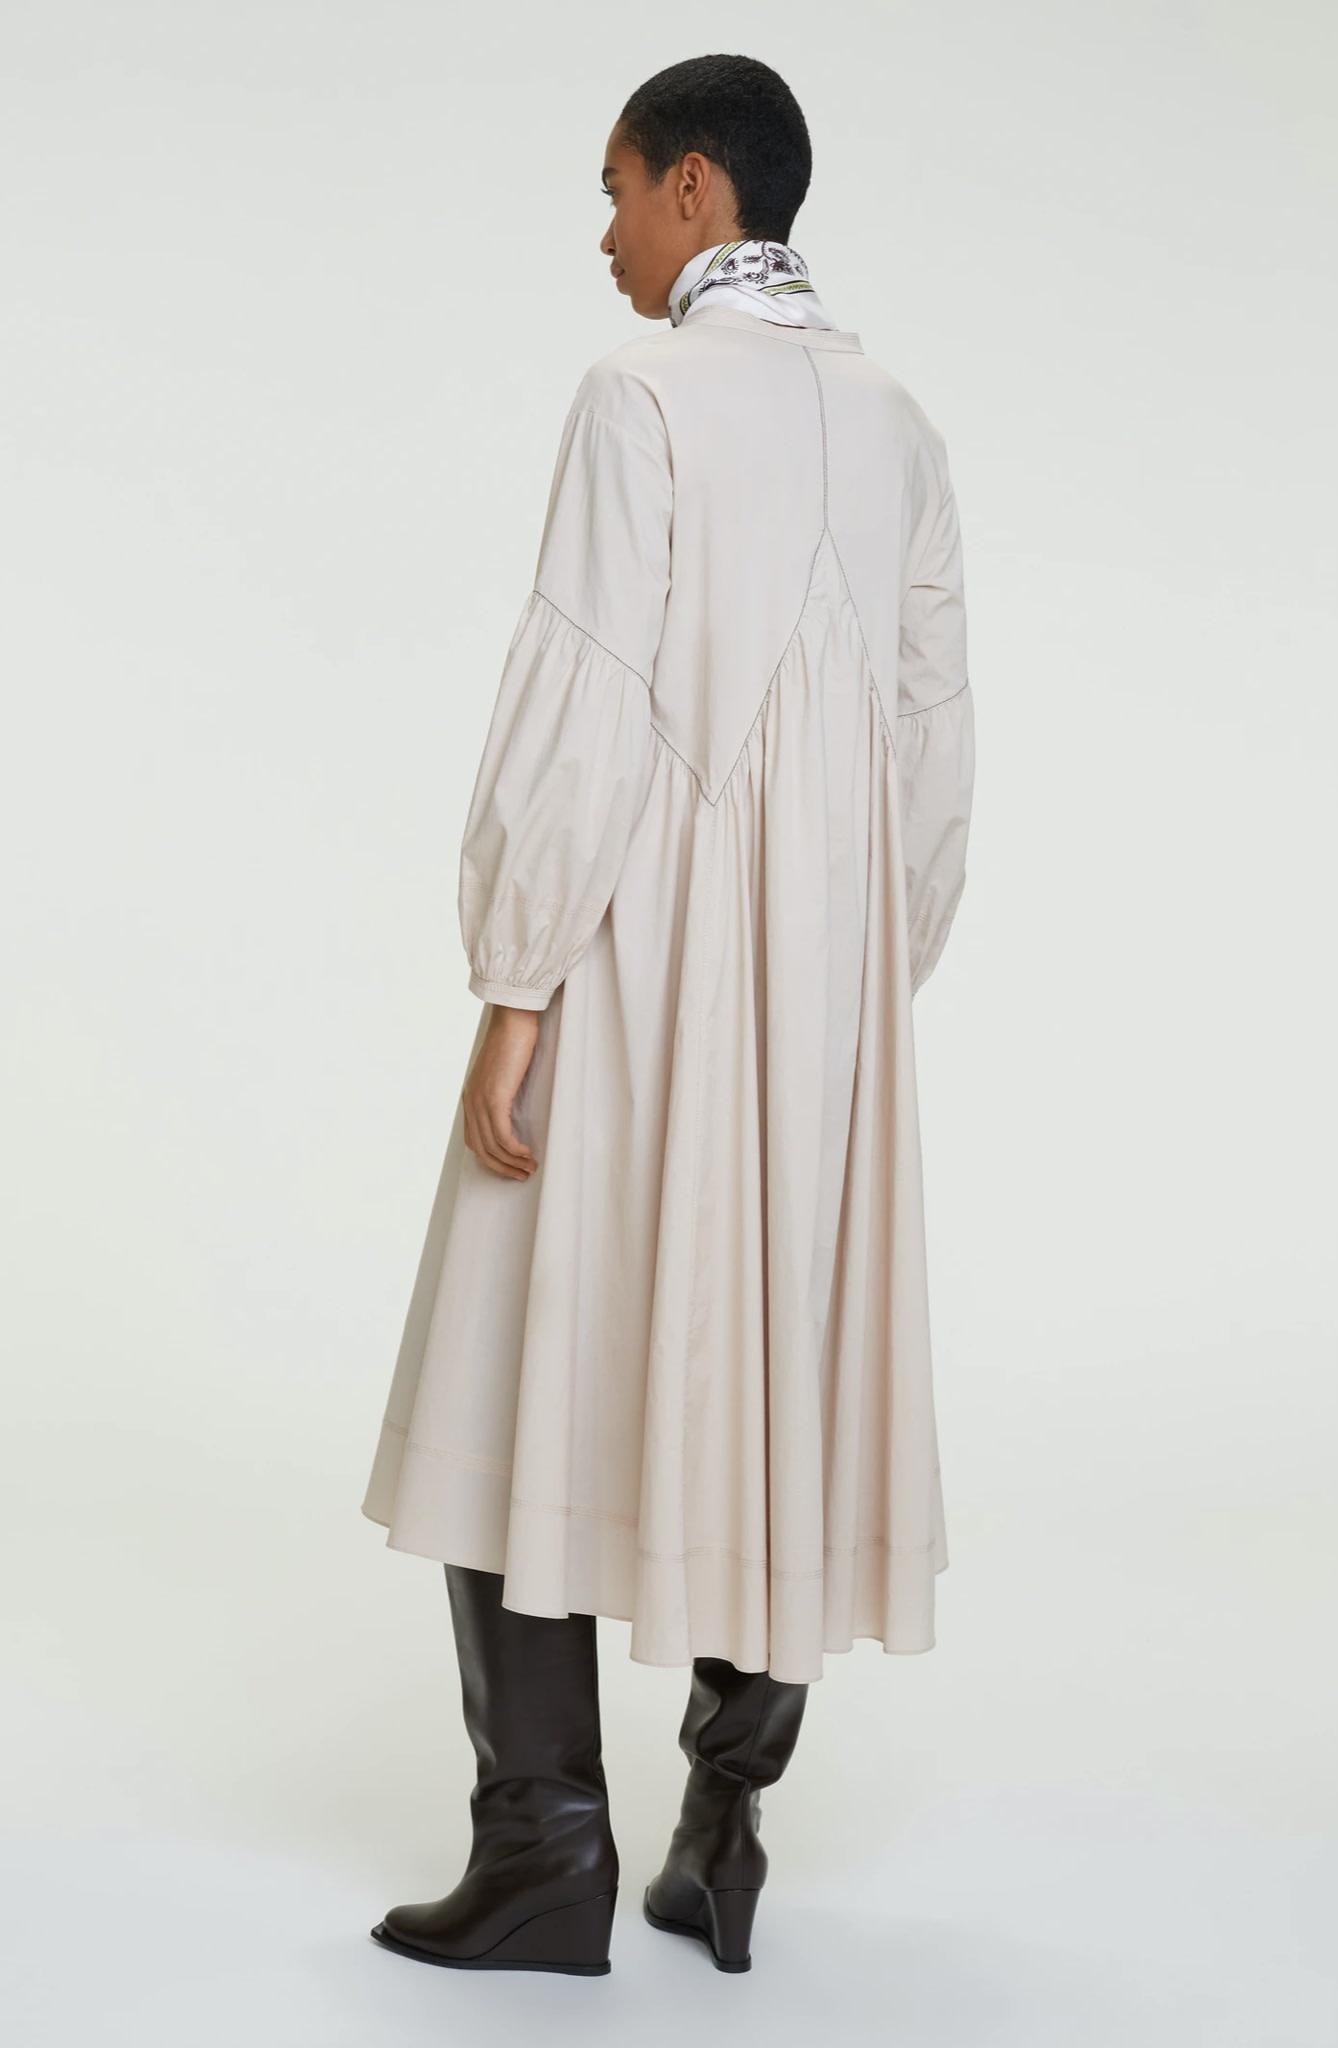 Popeline power dress dorothee schumacher-6